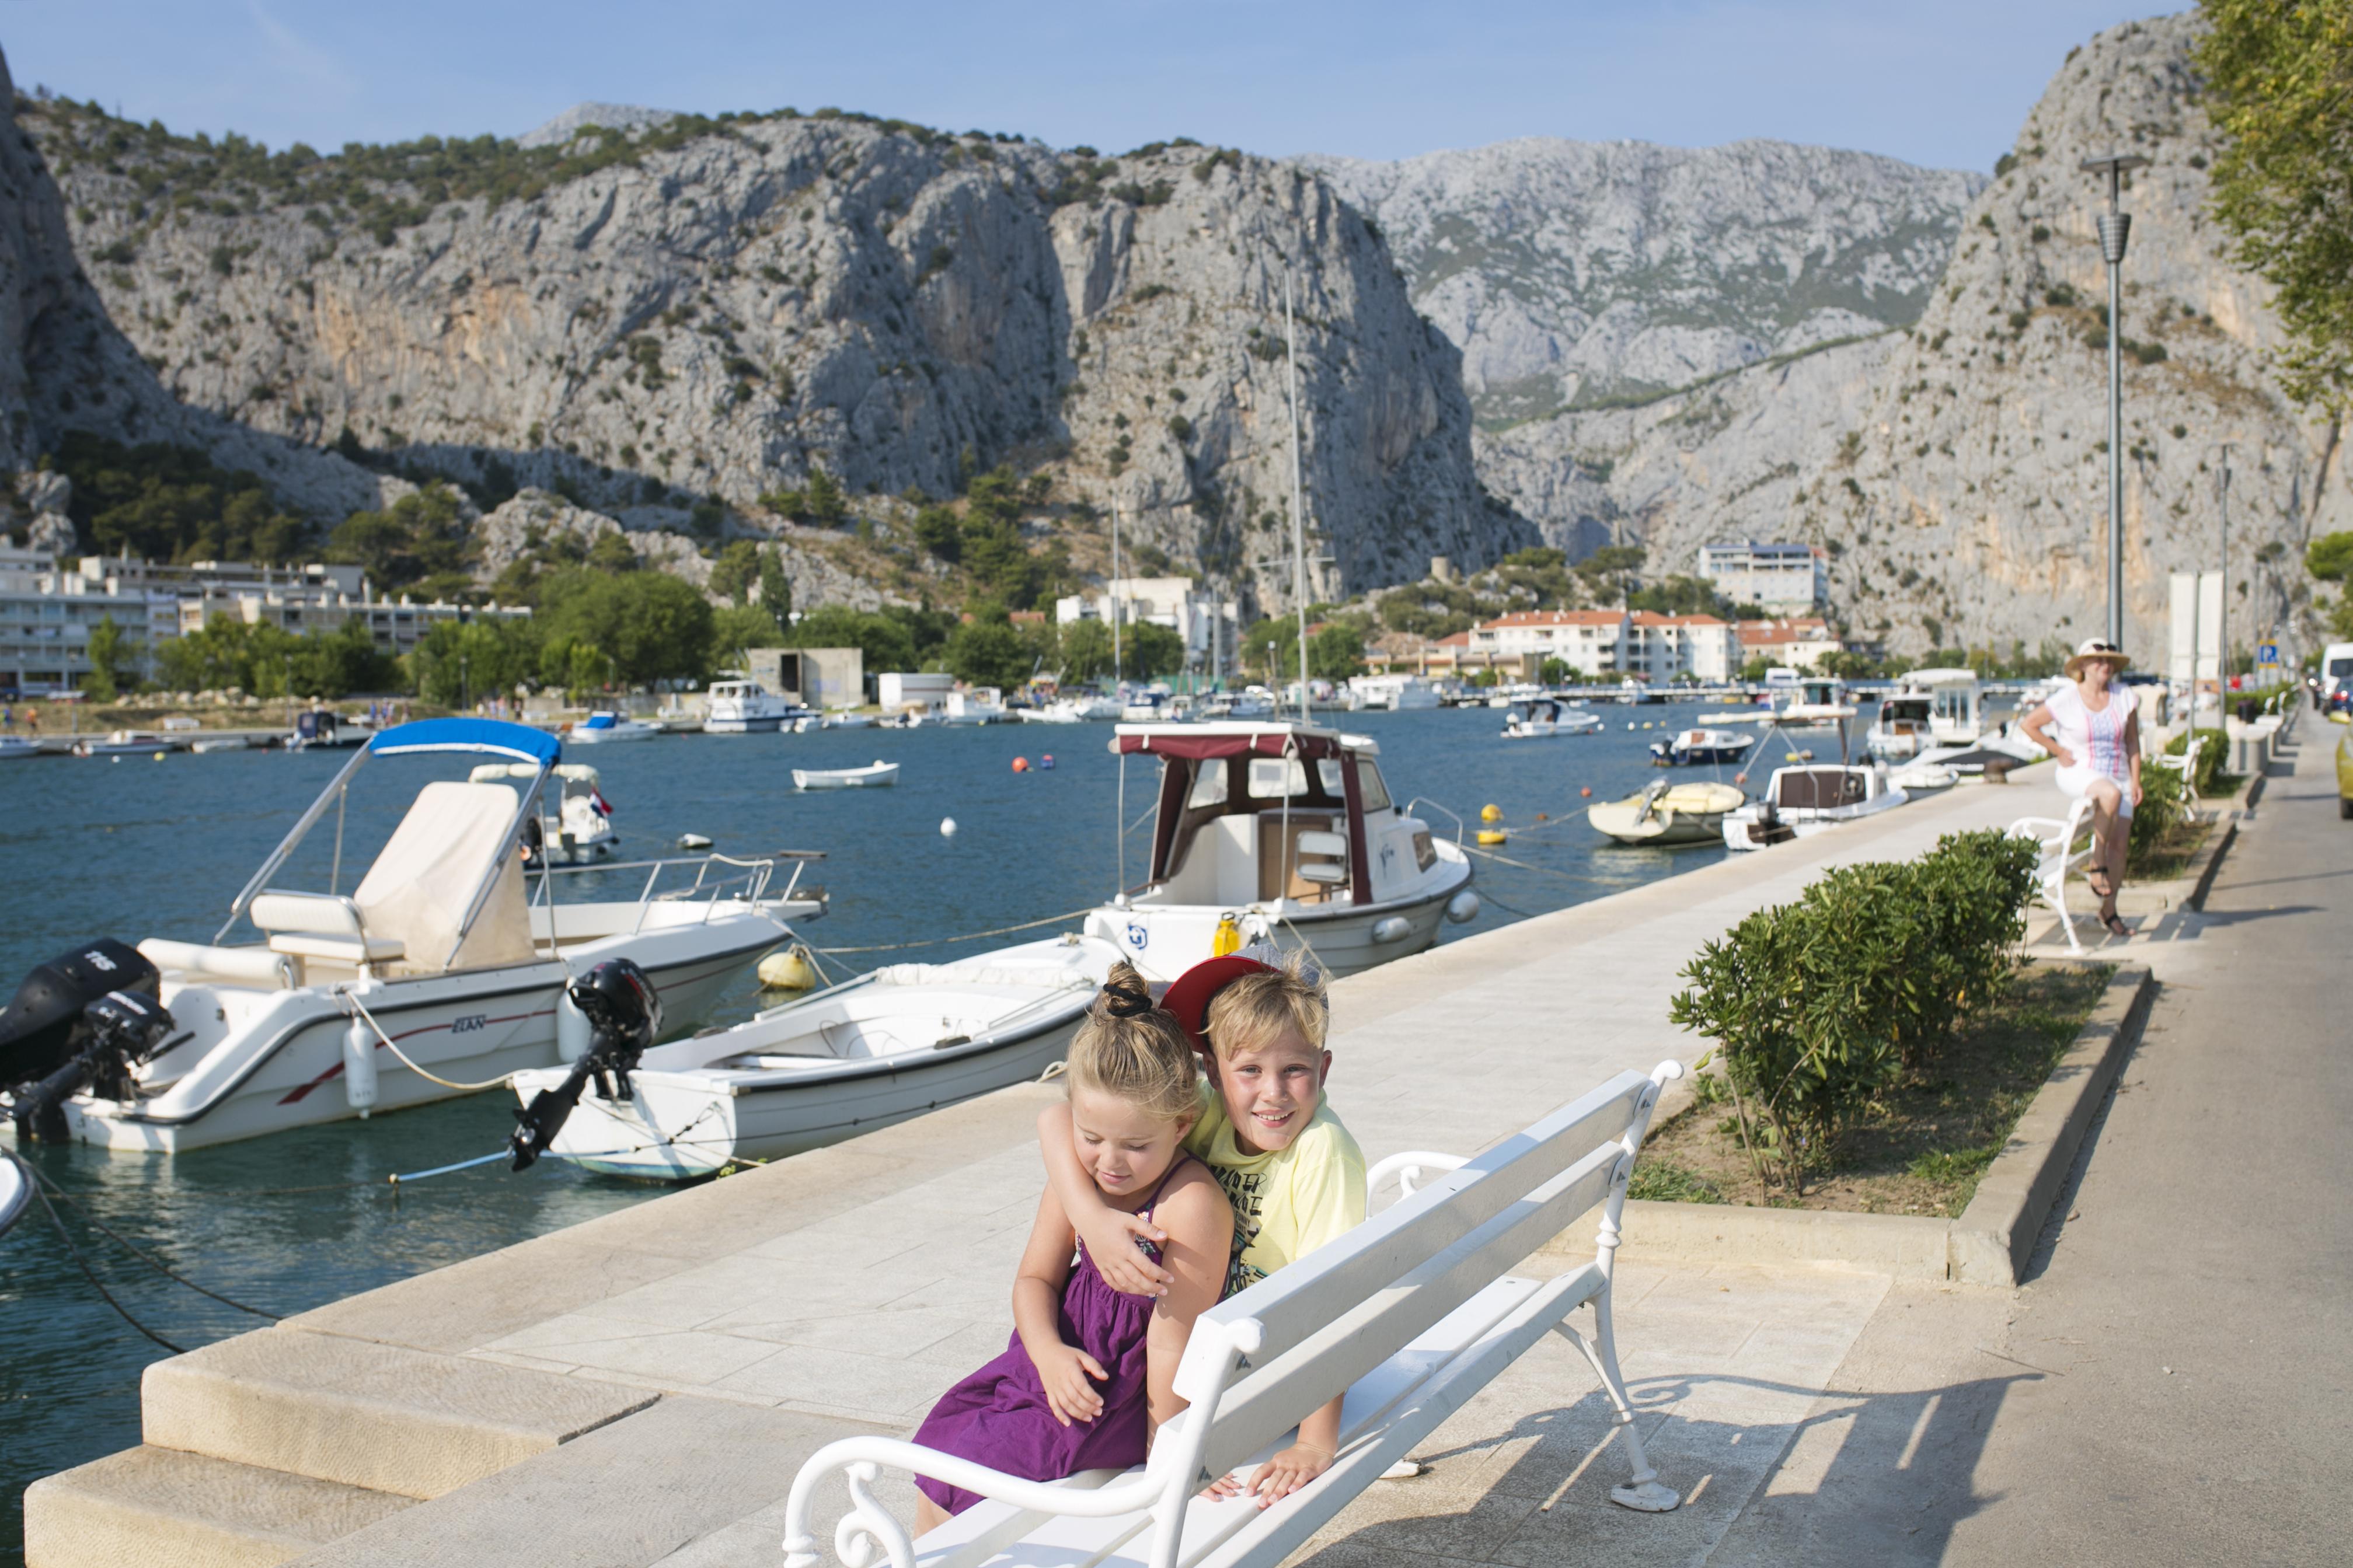 Omis, Omis port, Omis łódka, Omis dzieci